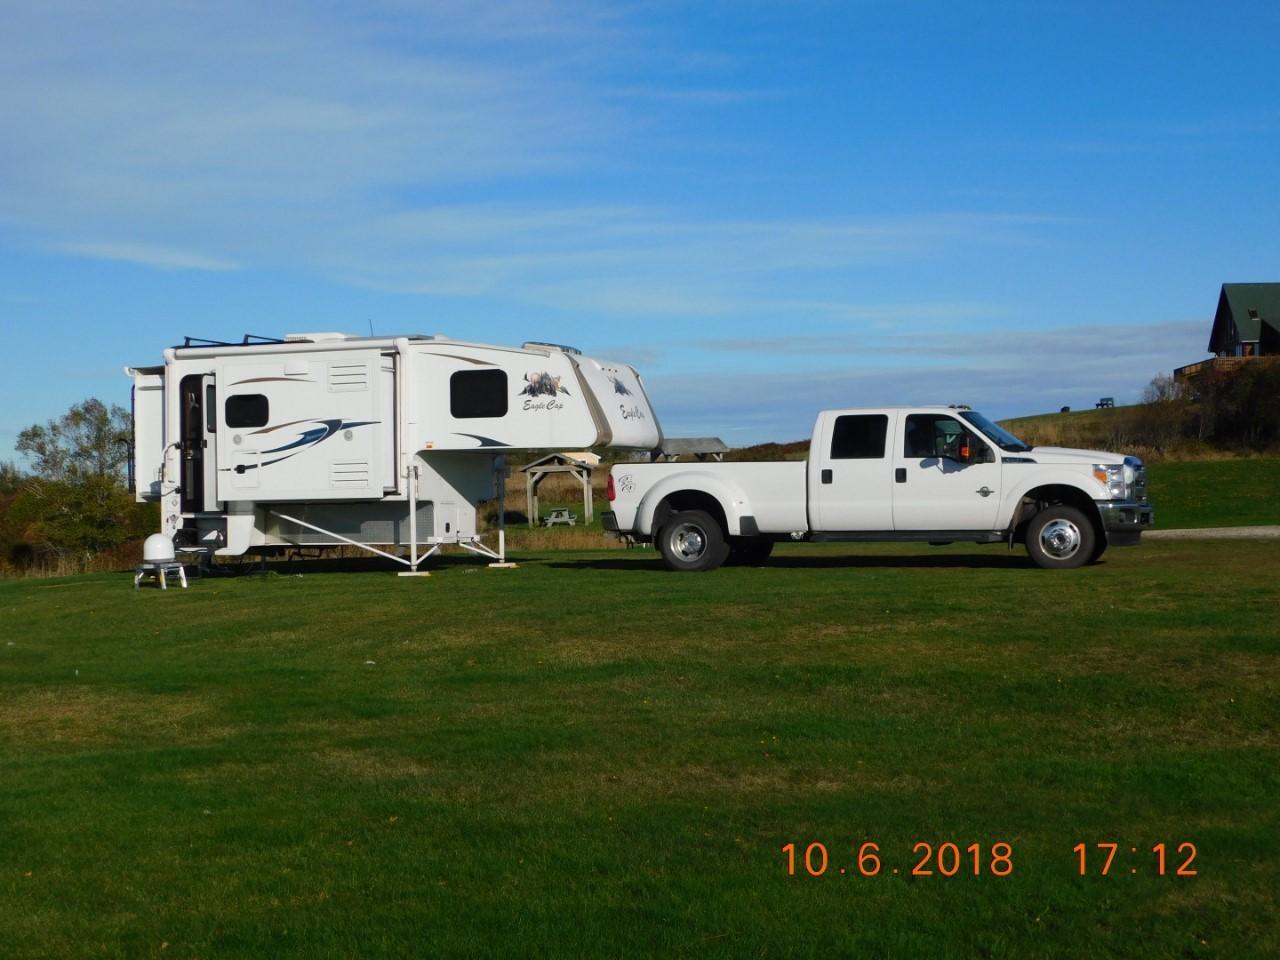 Camper Shells For Sale Near Me >> Truck Camper Shells Near Me